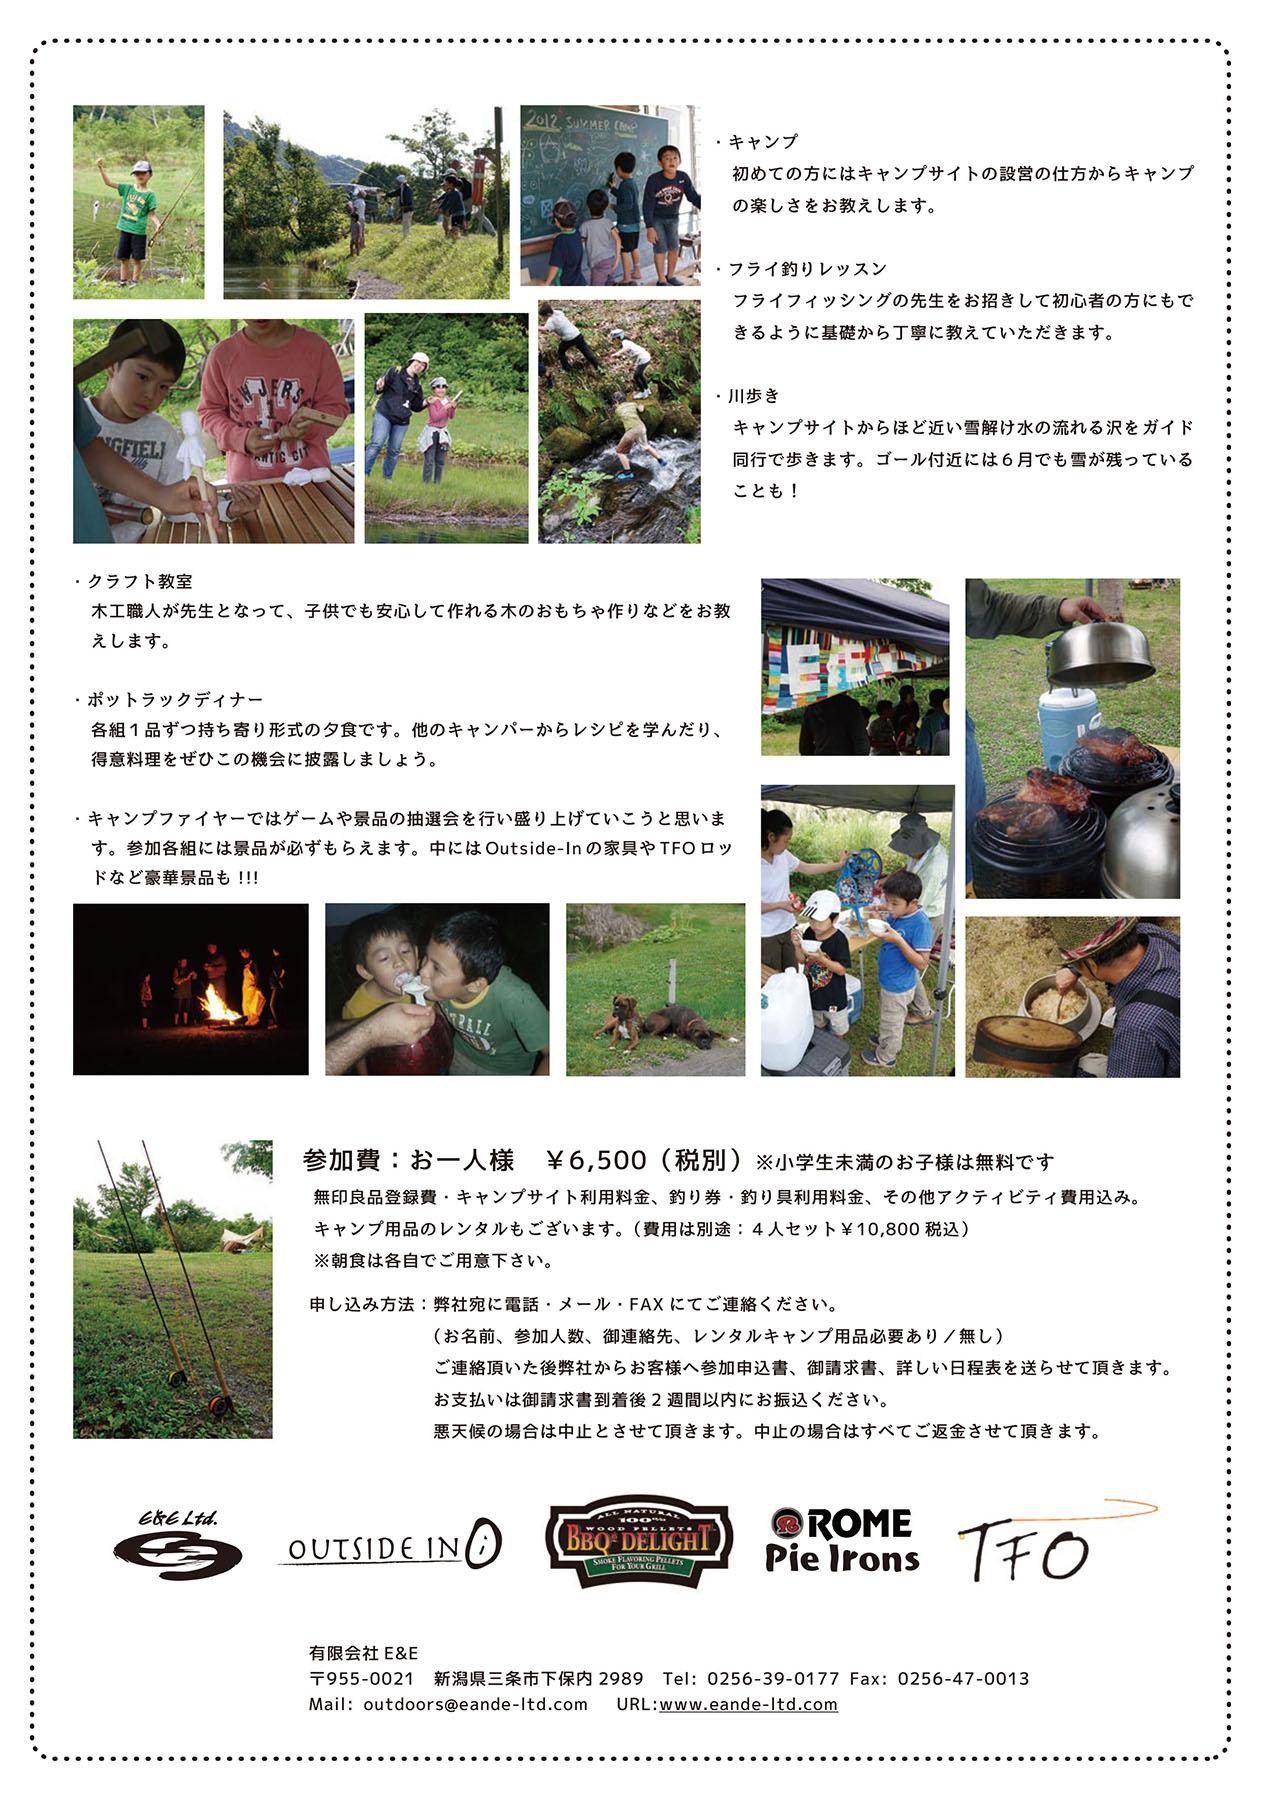 「E&E親子キャンプ・釣りイベント2015」_c0127476_1204420.jpg